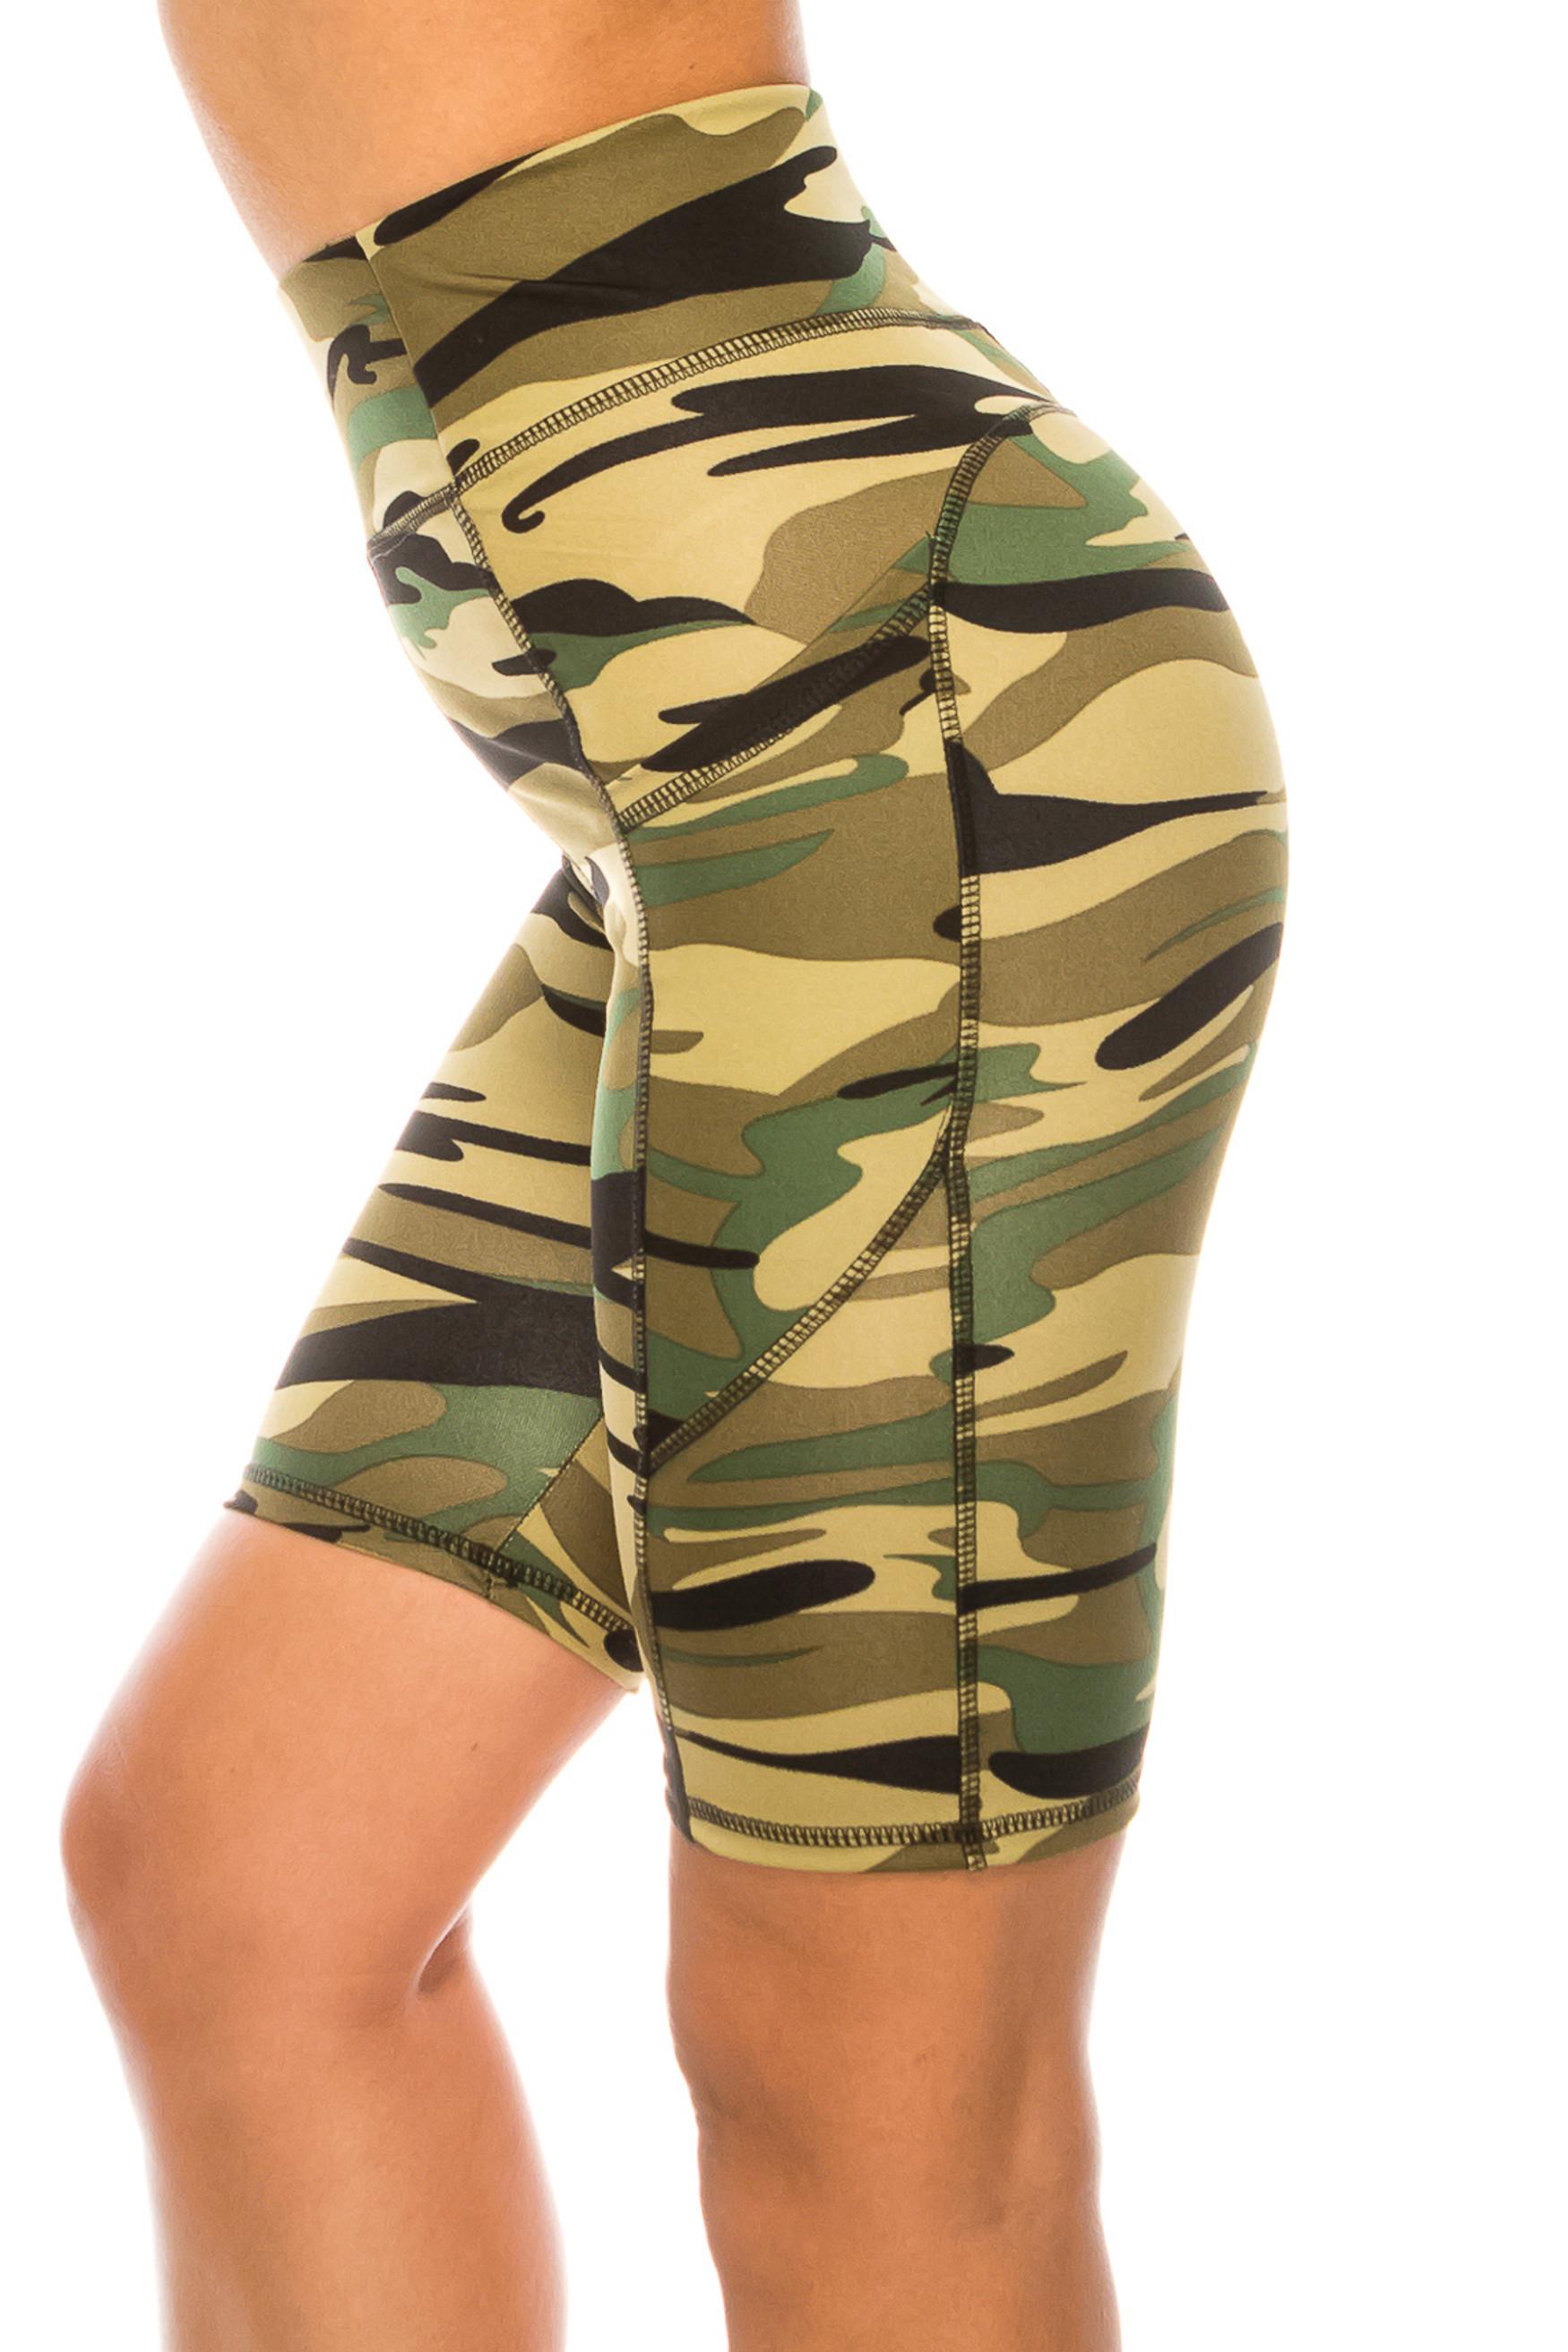 Green Camouflage High Waist Biker Sport Shorts with Pockets